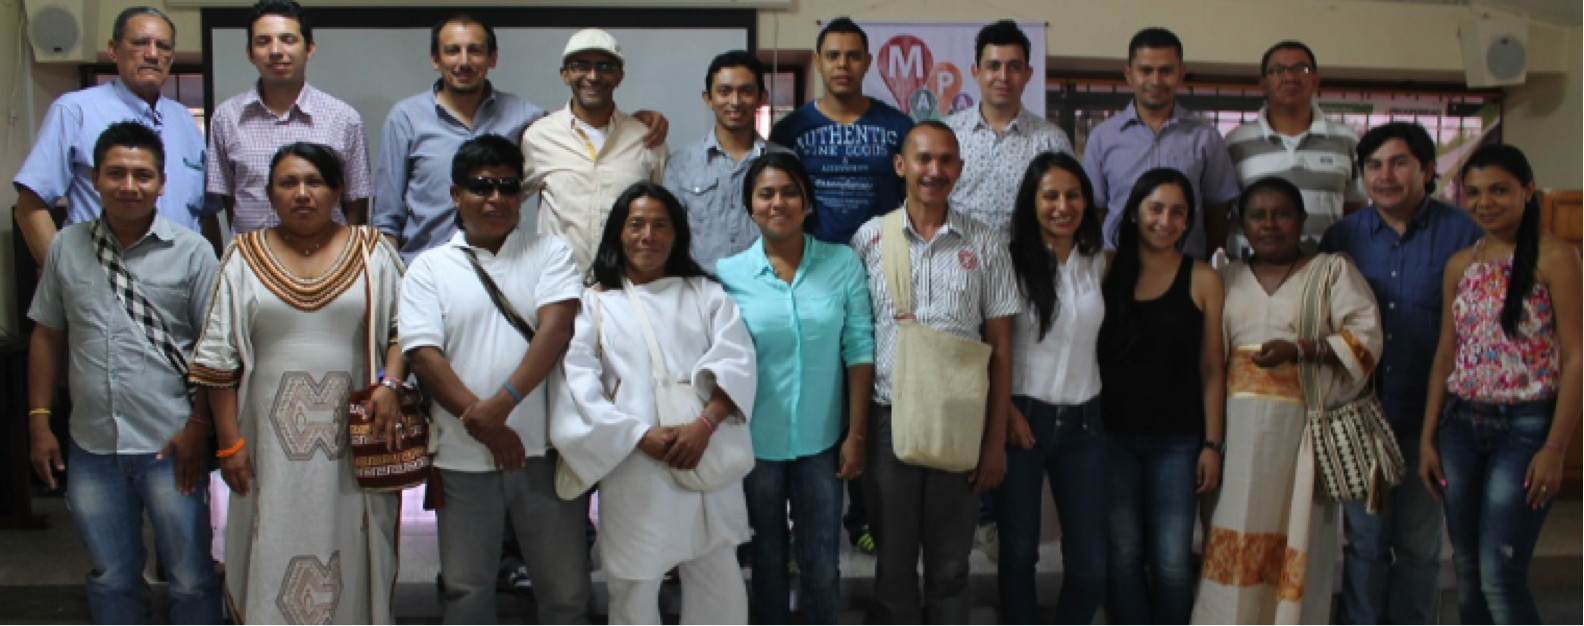 Grupos étnicos que participaron en el taller organizado por Corpoica. Cortesía: Corpoica